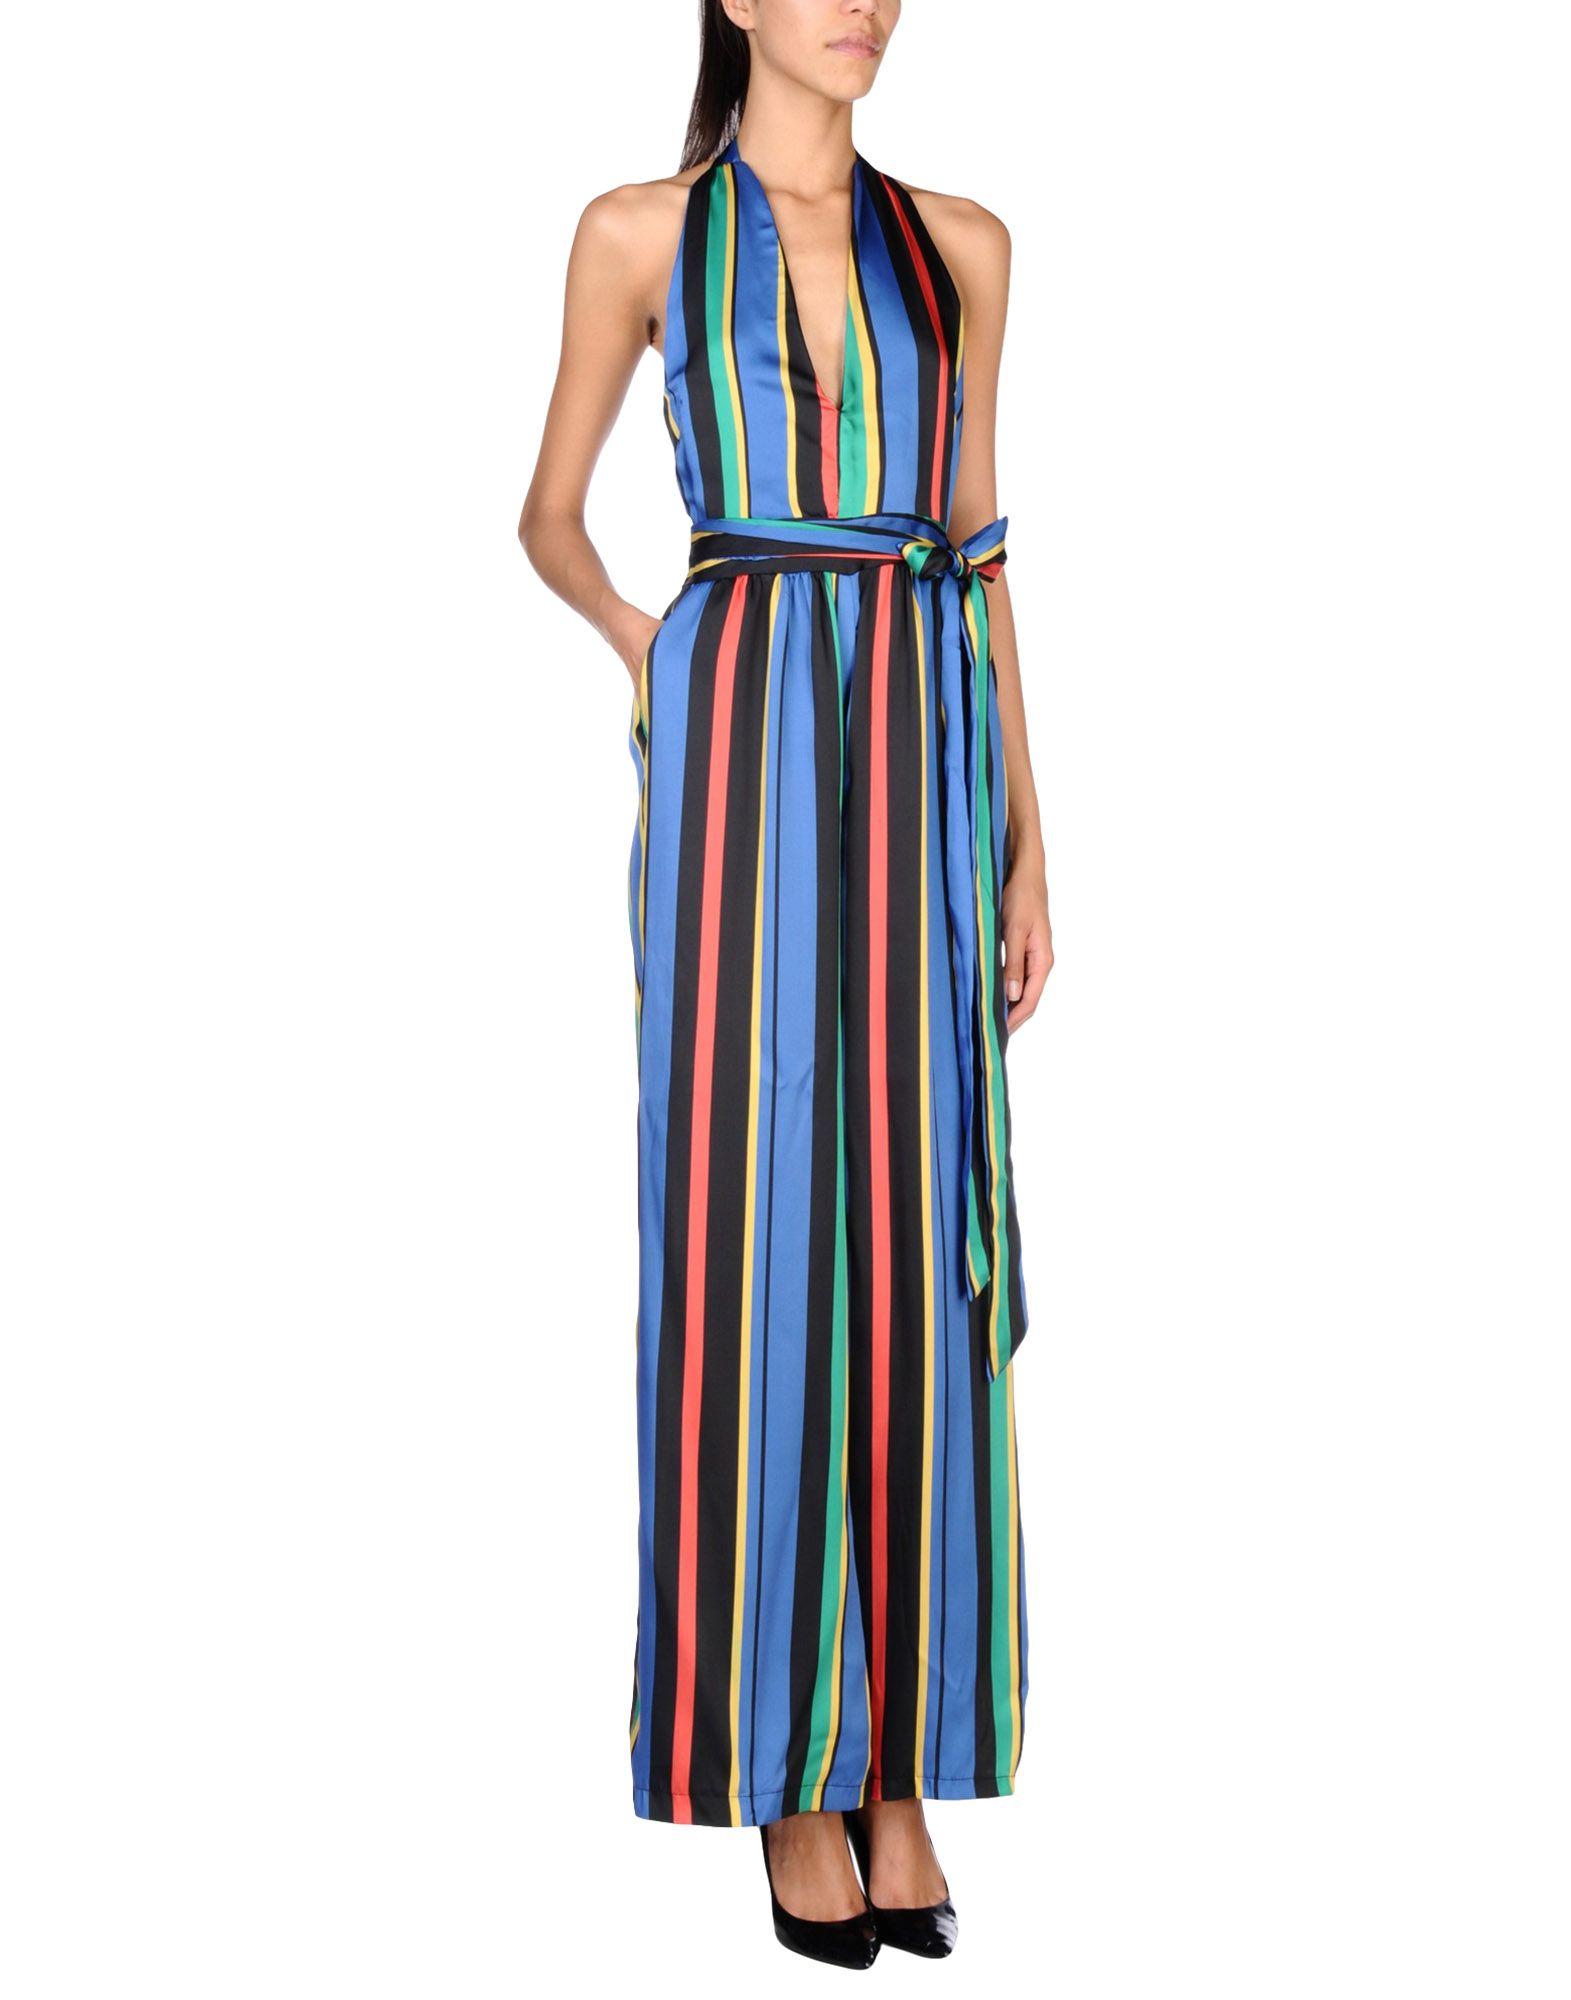 TWENTY EASY by KAOS Комбинезоны без бретелей платье miss selfridge miss selfridge mi035ewxsa50